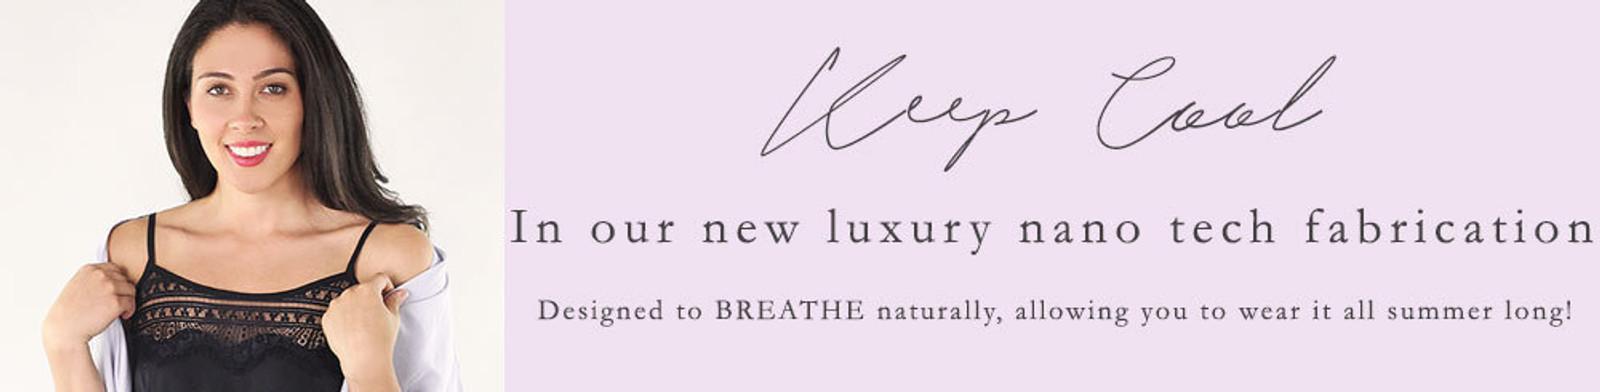 Summer's Luxury fabric